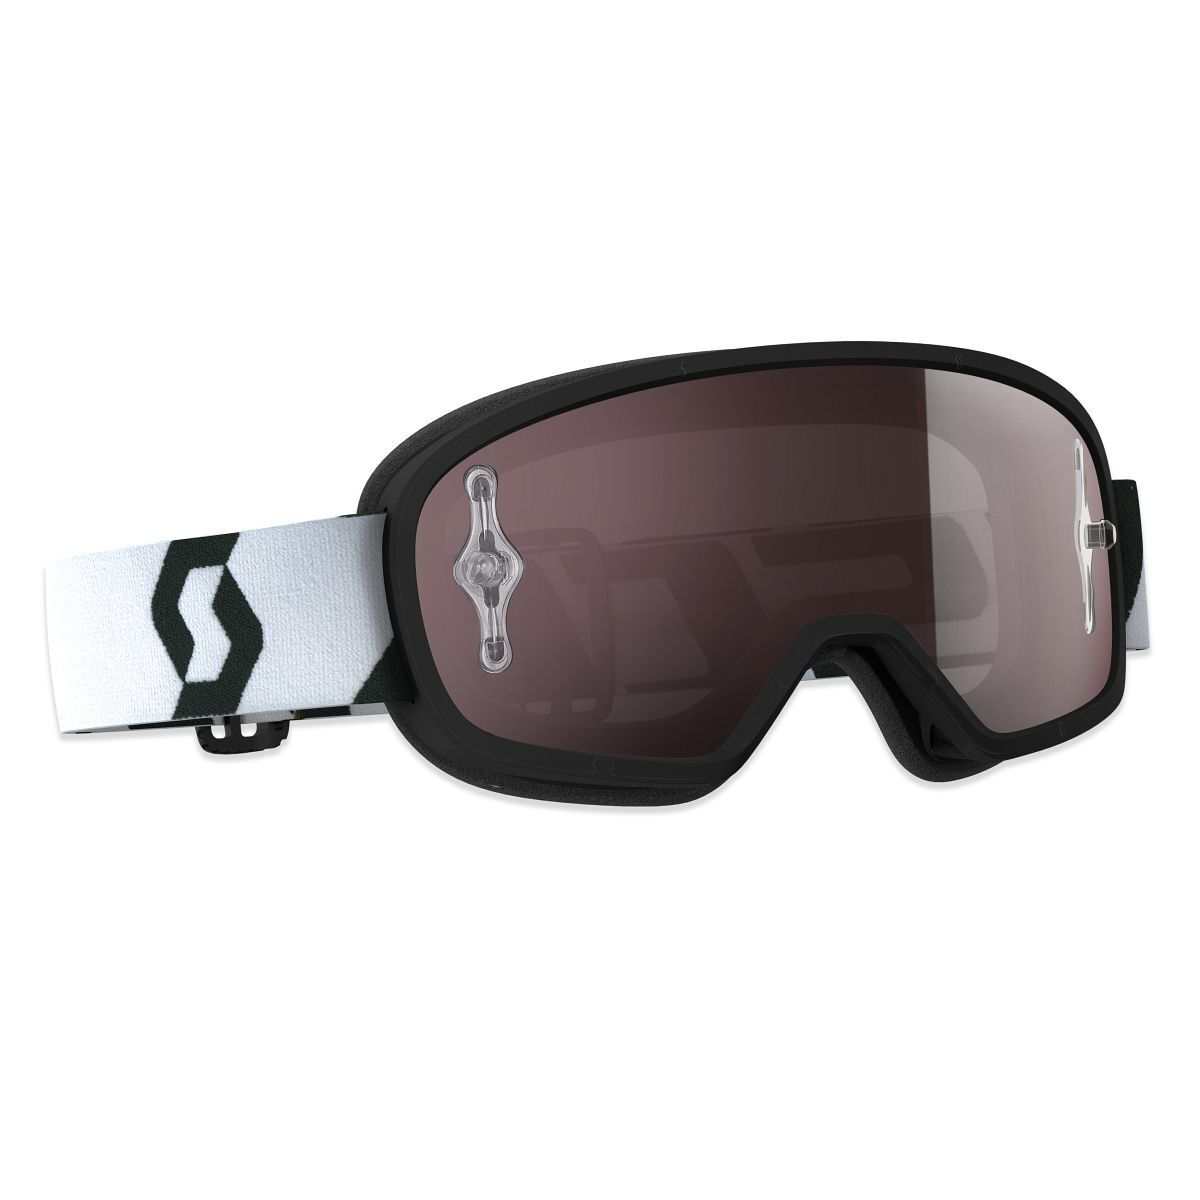 Scott Buzz Pro Kinder MX Goggle Cross MTB Brille black silverfarben chrome wor